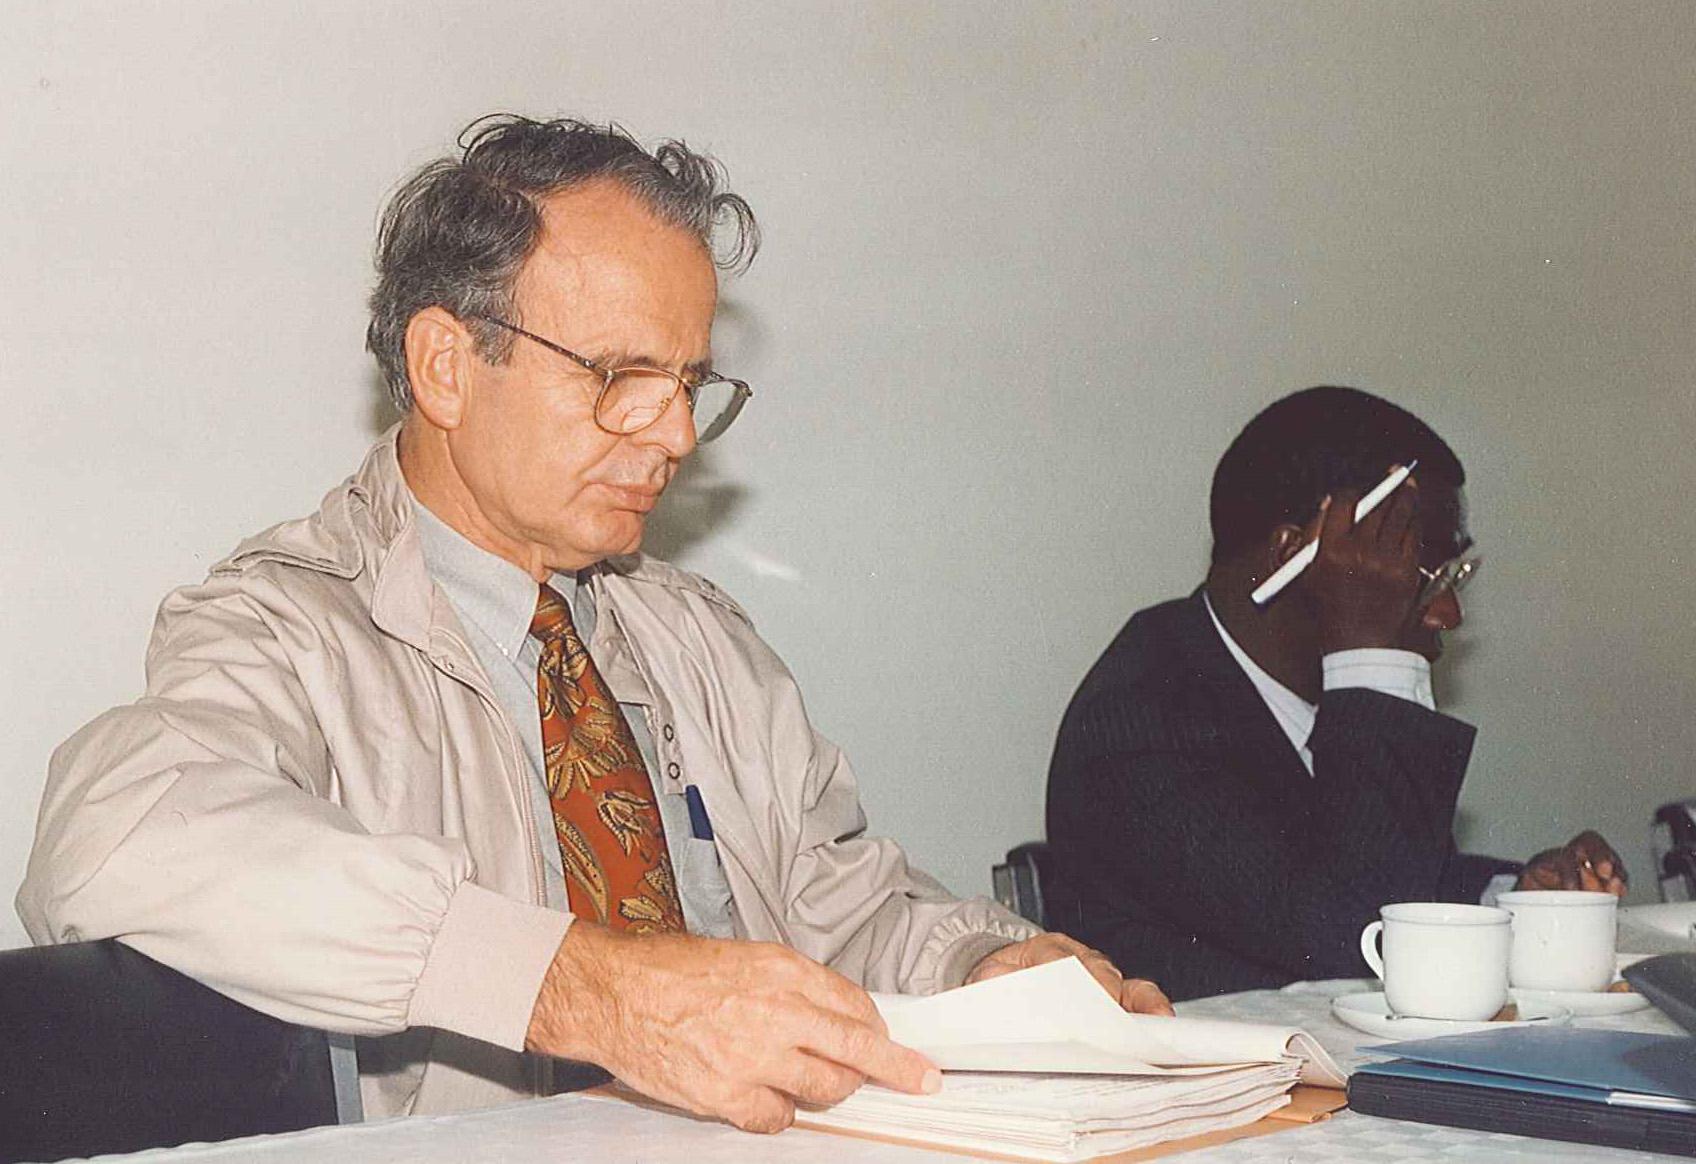 Daystar University Board Meeting, 1993